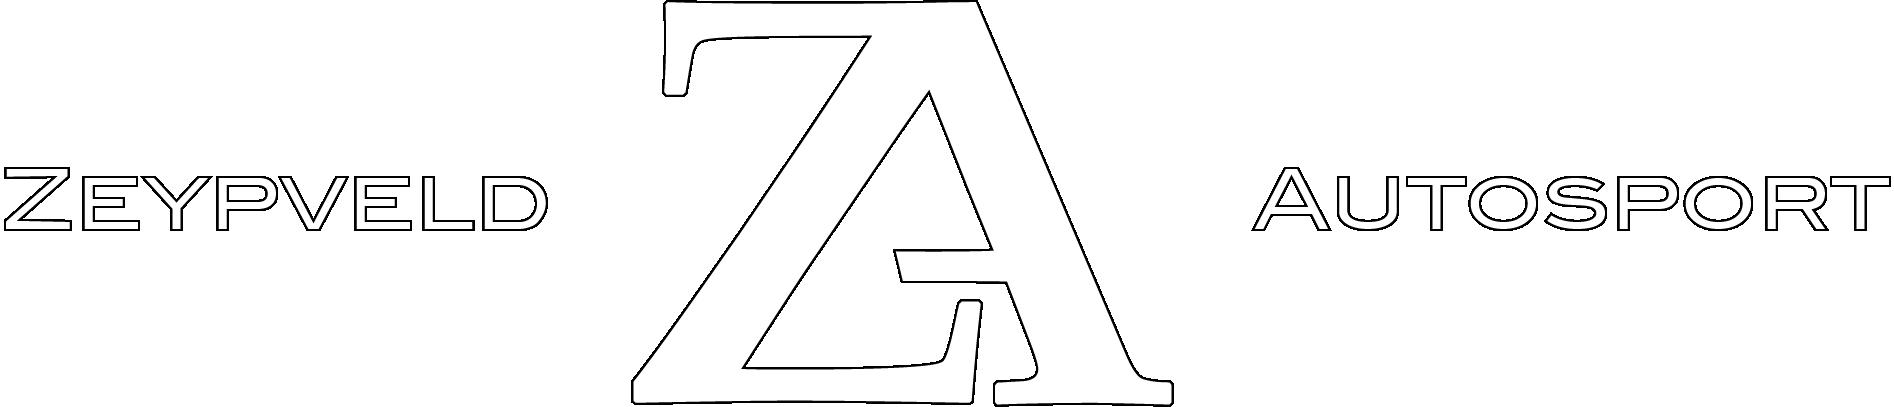 Zeypveld Autosport - Logo line